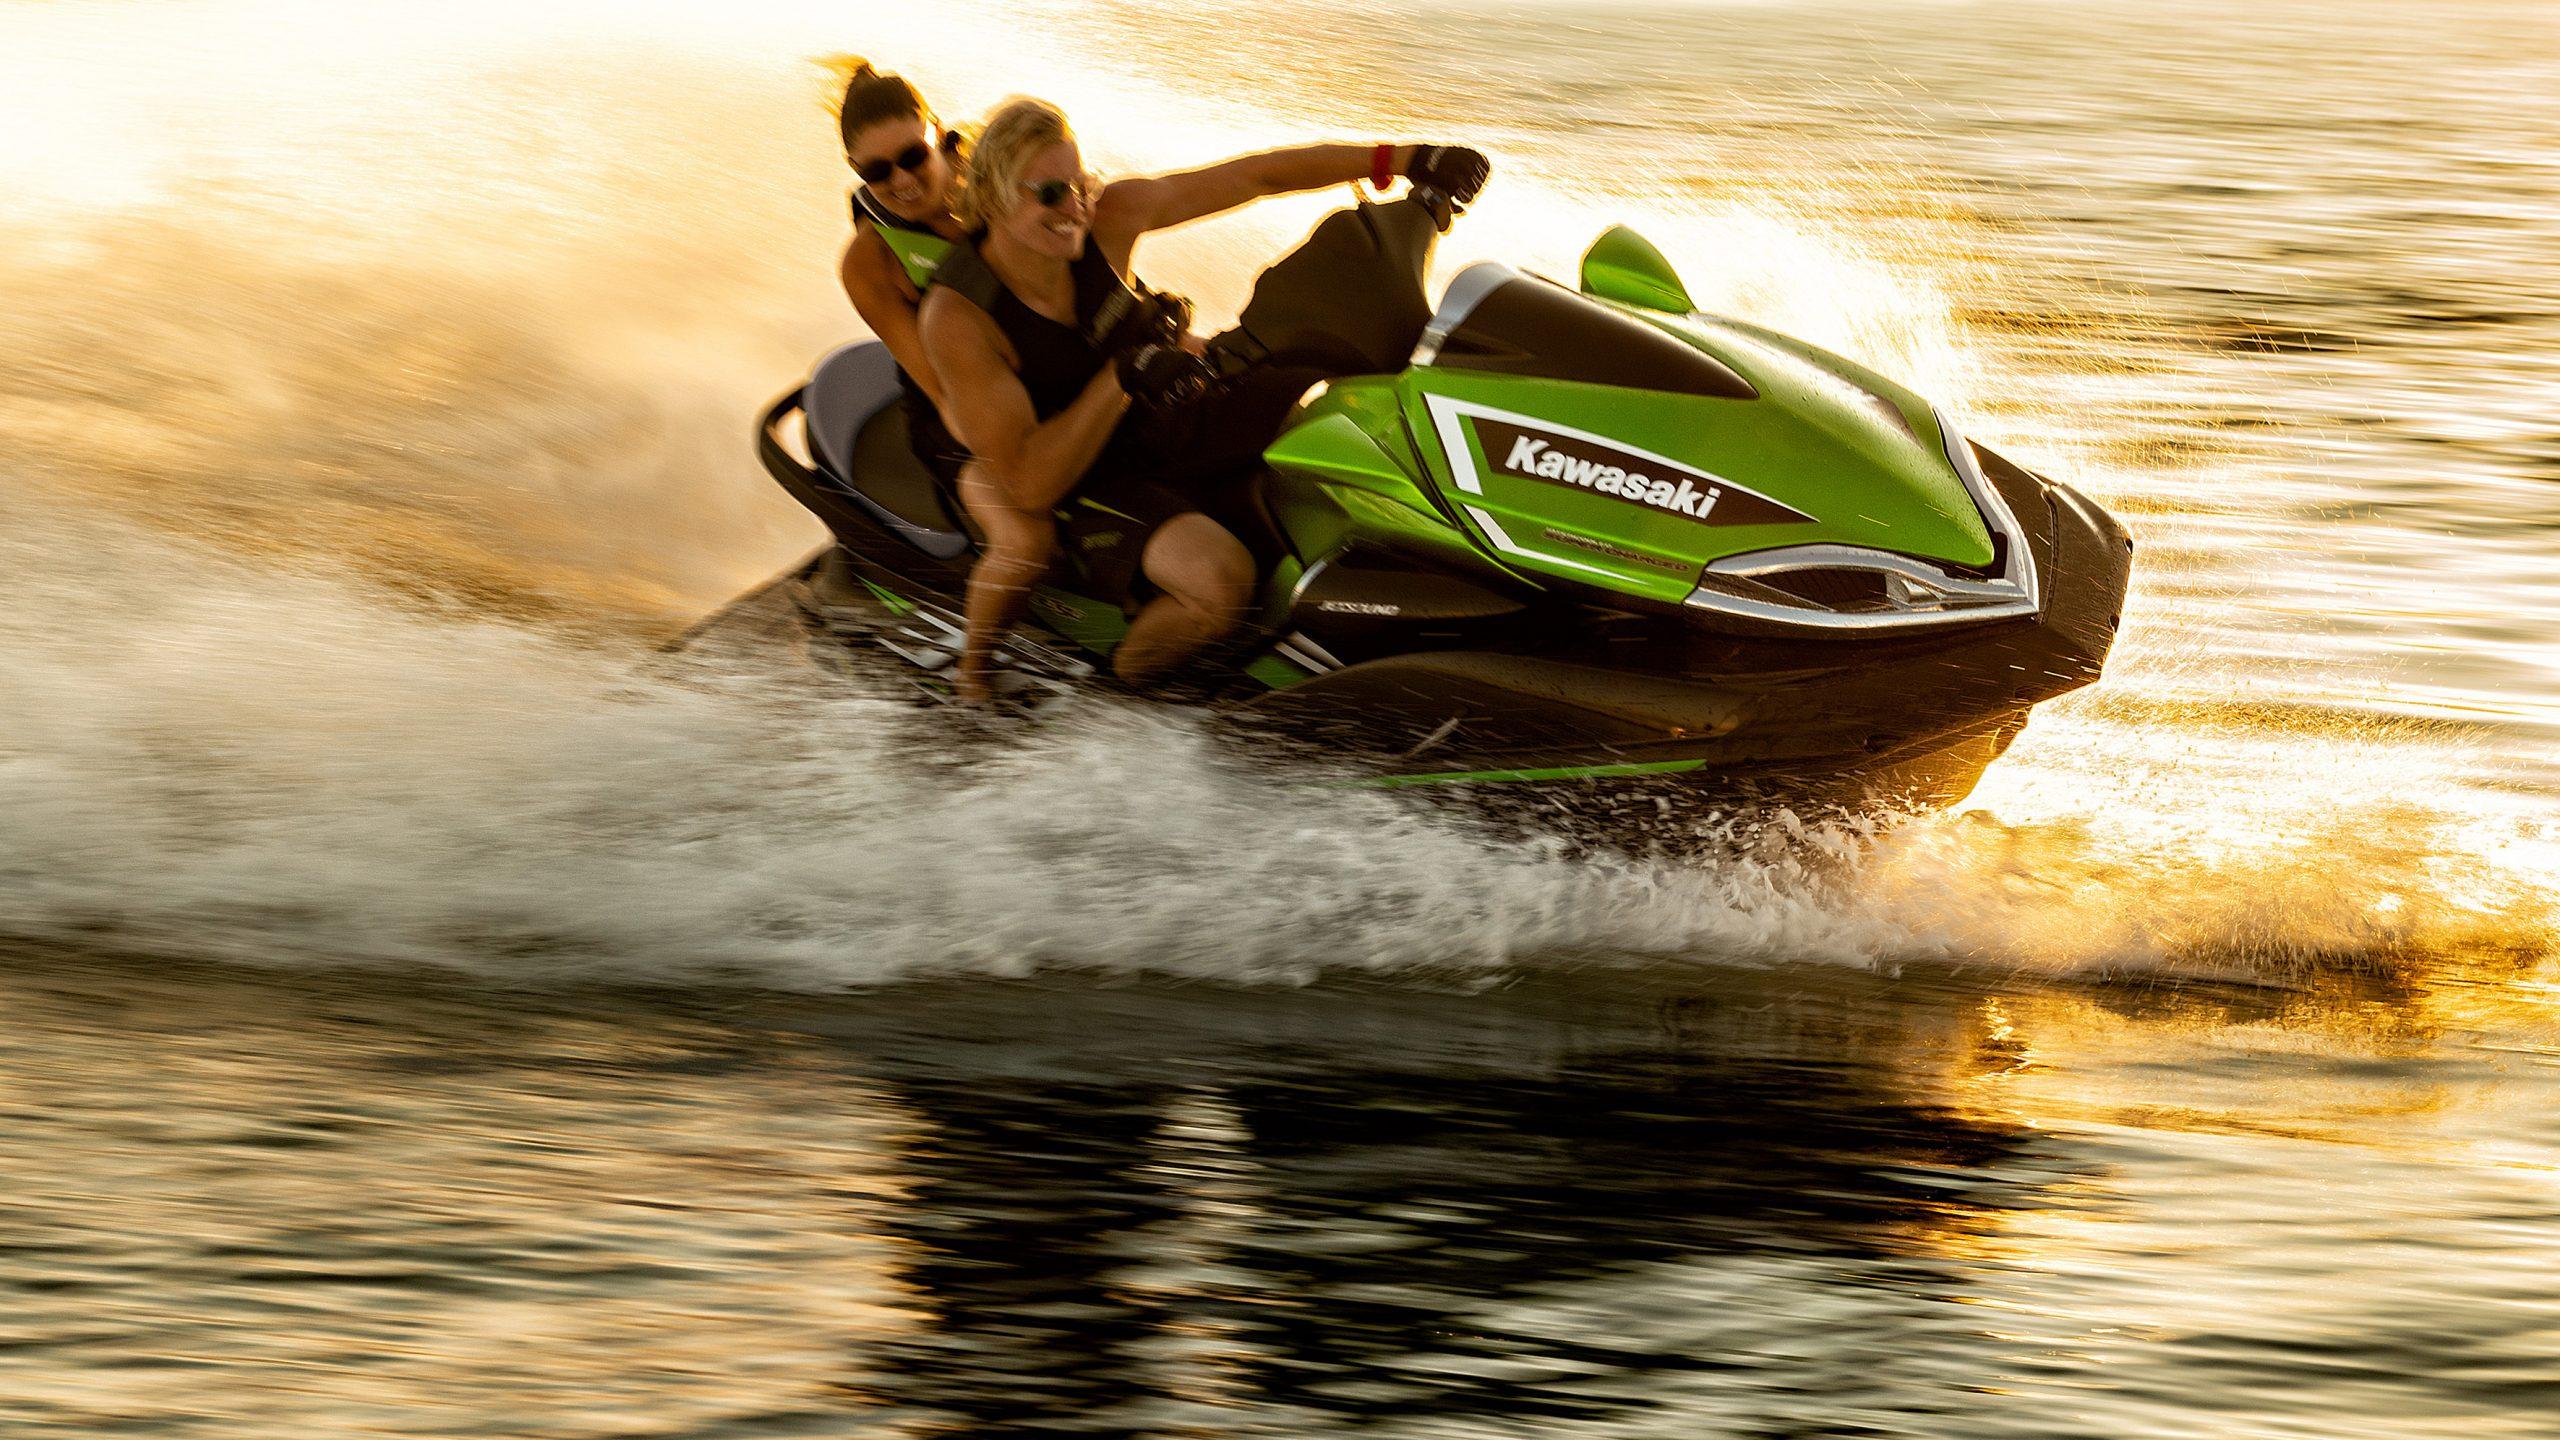 Jet Ski and personal watercraft licences surge during the coronavirus crisis